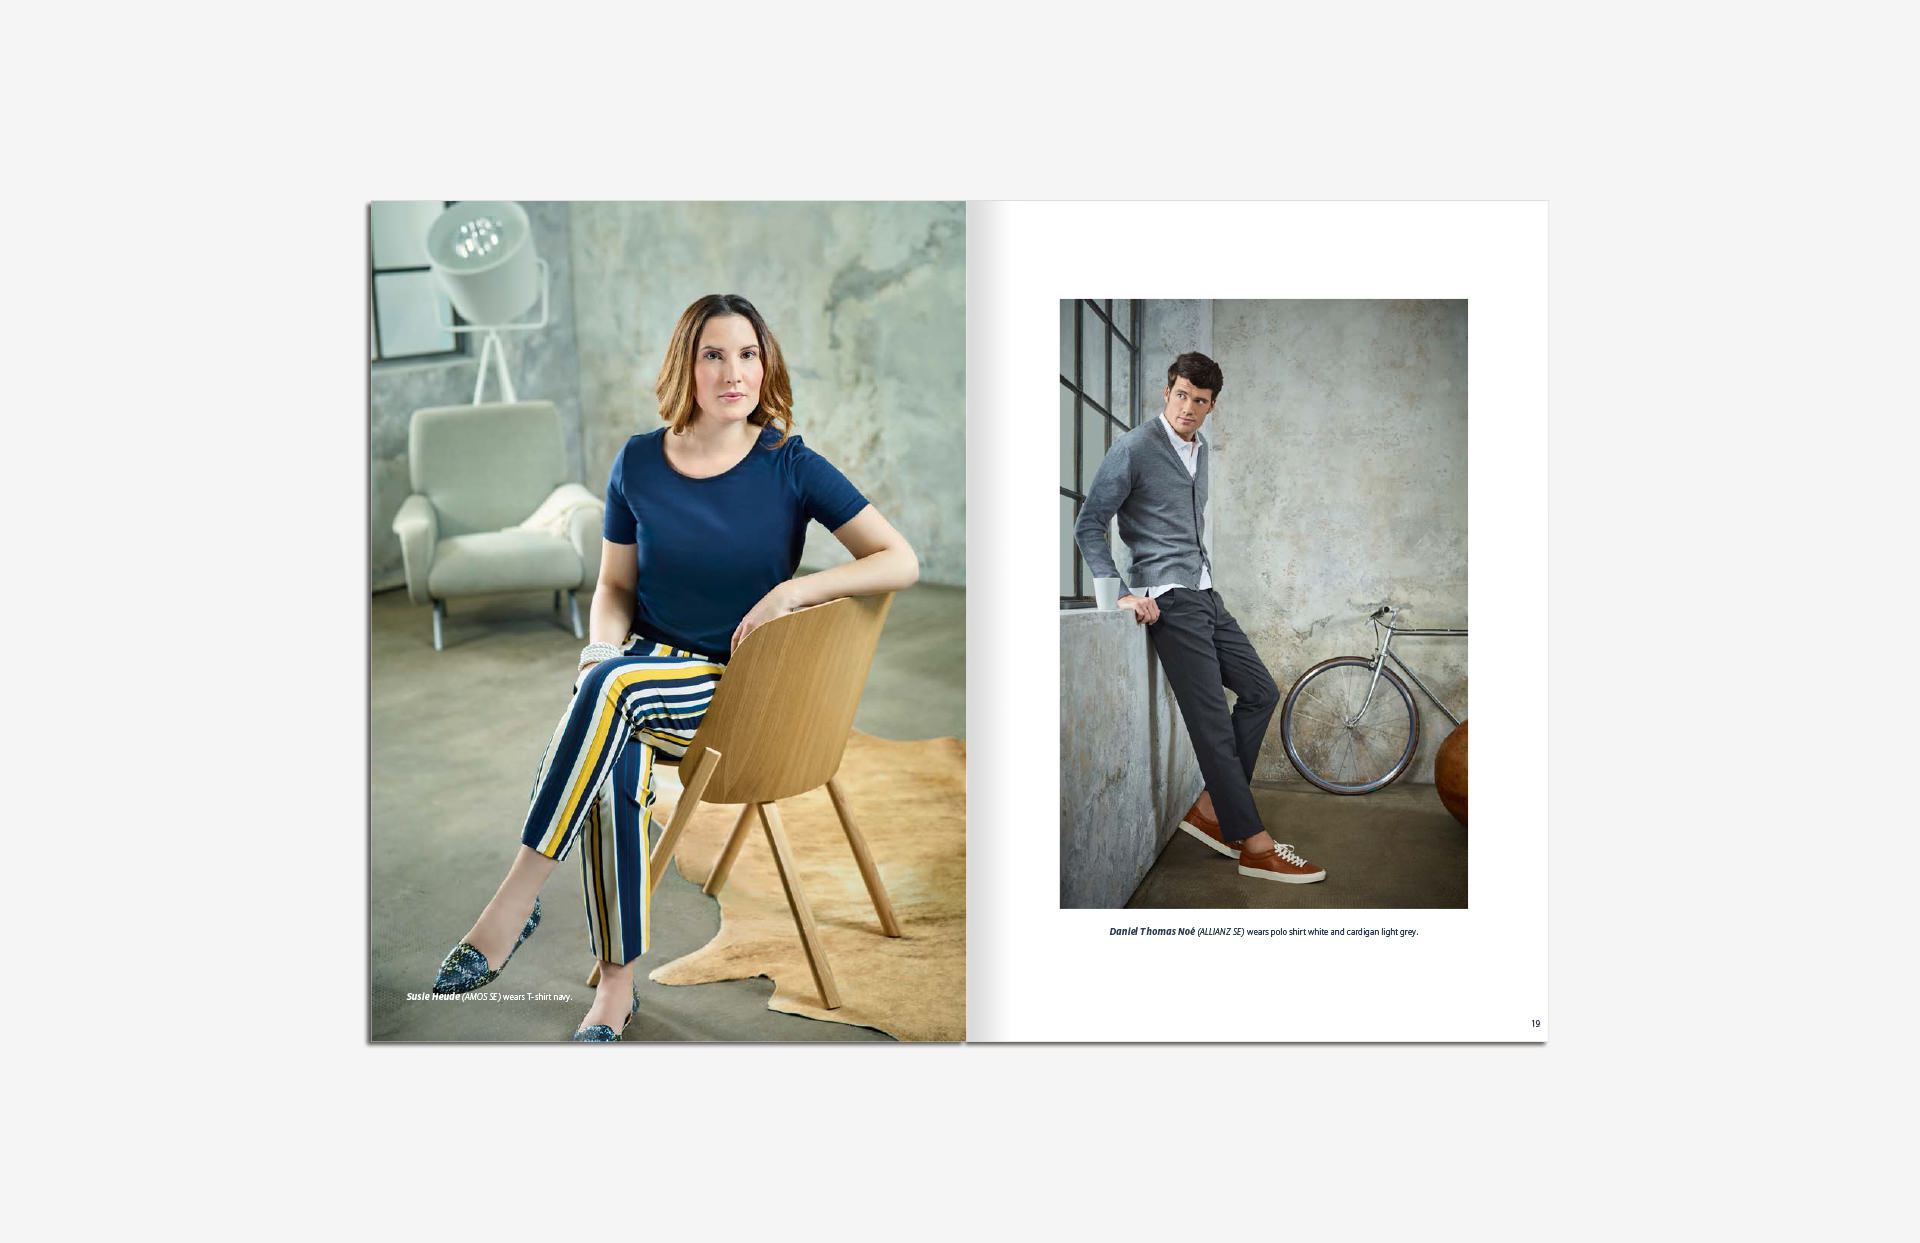 Allianz SE catalog katalog Marketing Strategy design fashion collection shooting blue world layout print LAKE5 Consulting GmbH Hannover Germany